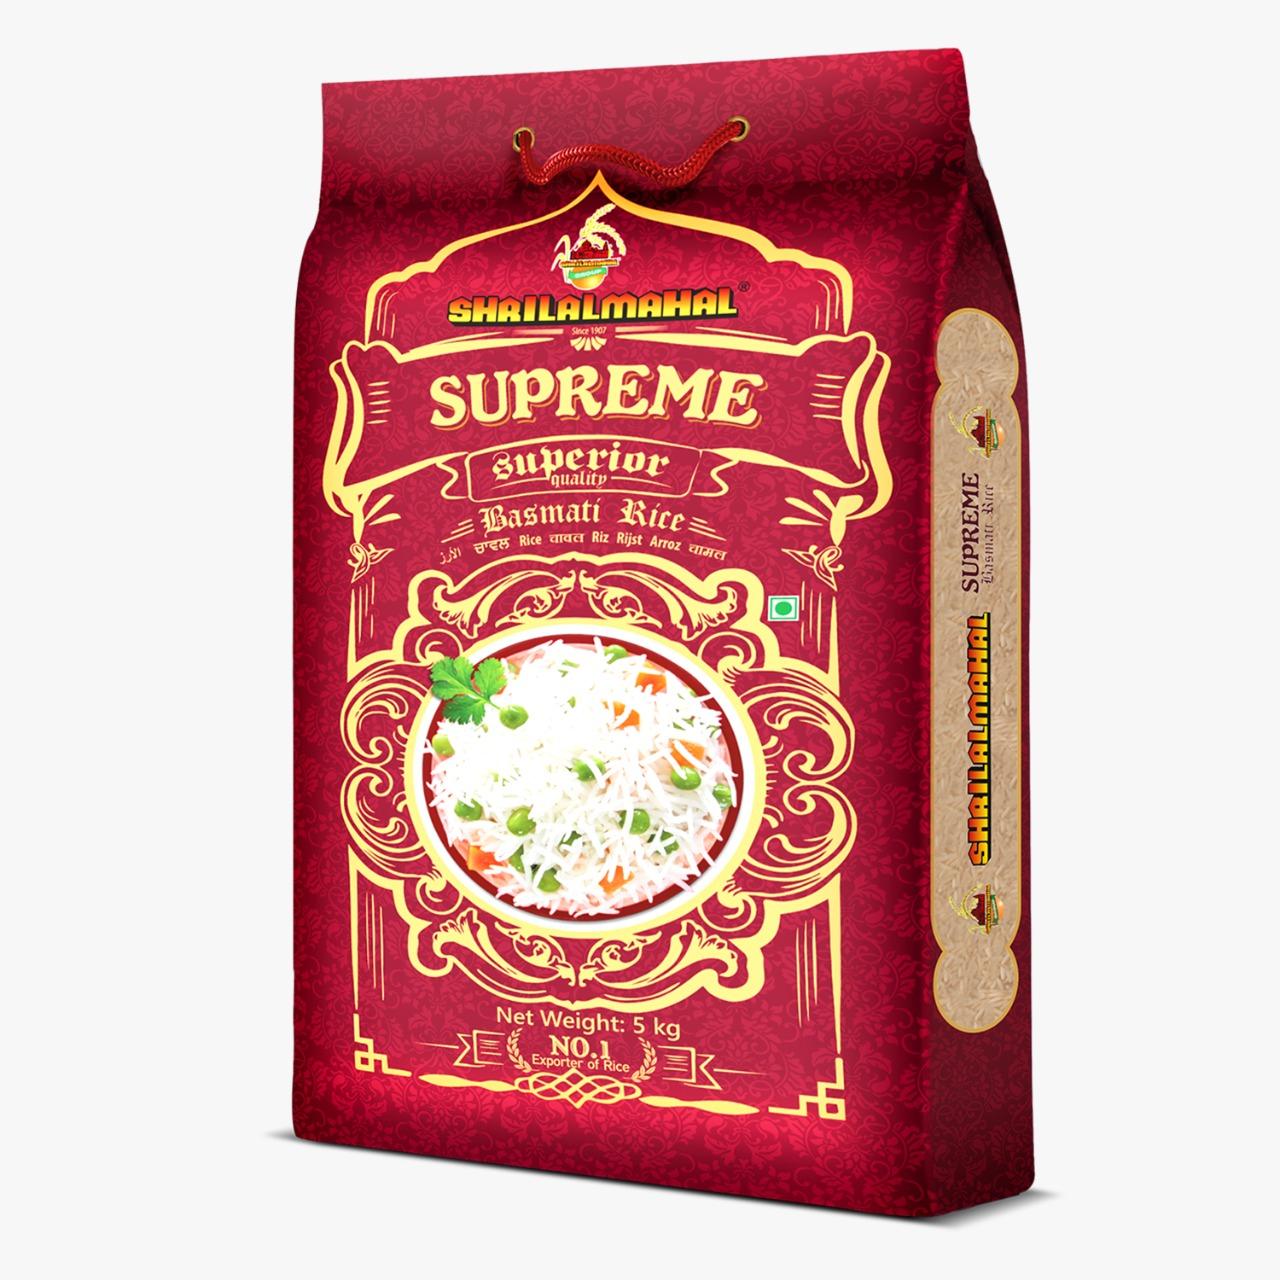 Shri Lal Mahal Basmati Rice